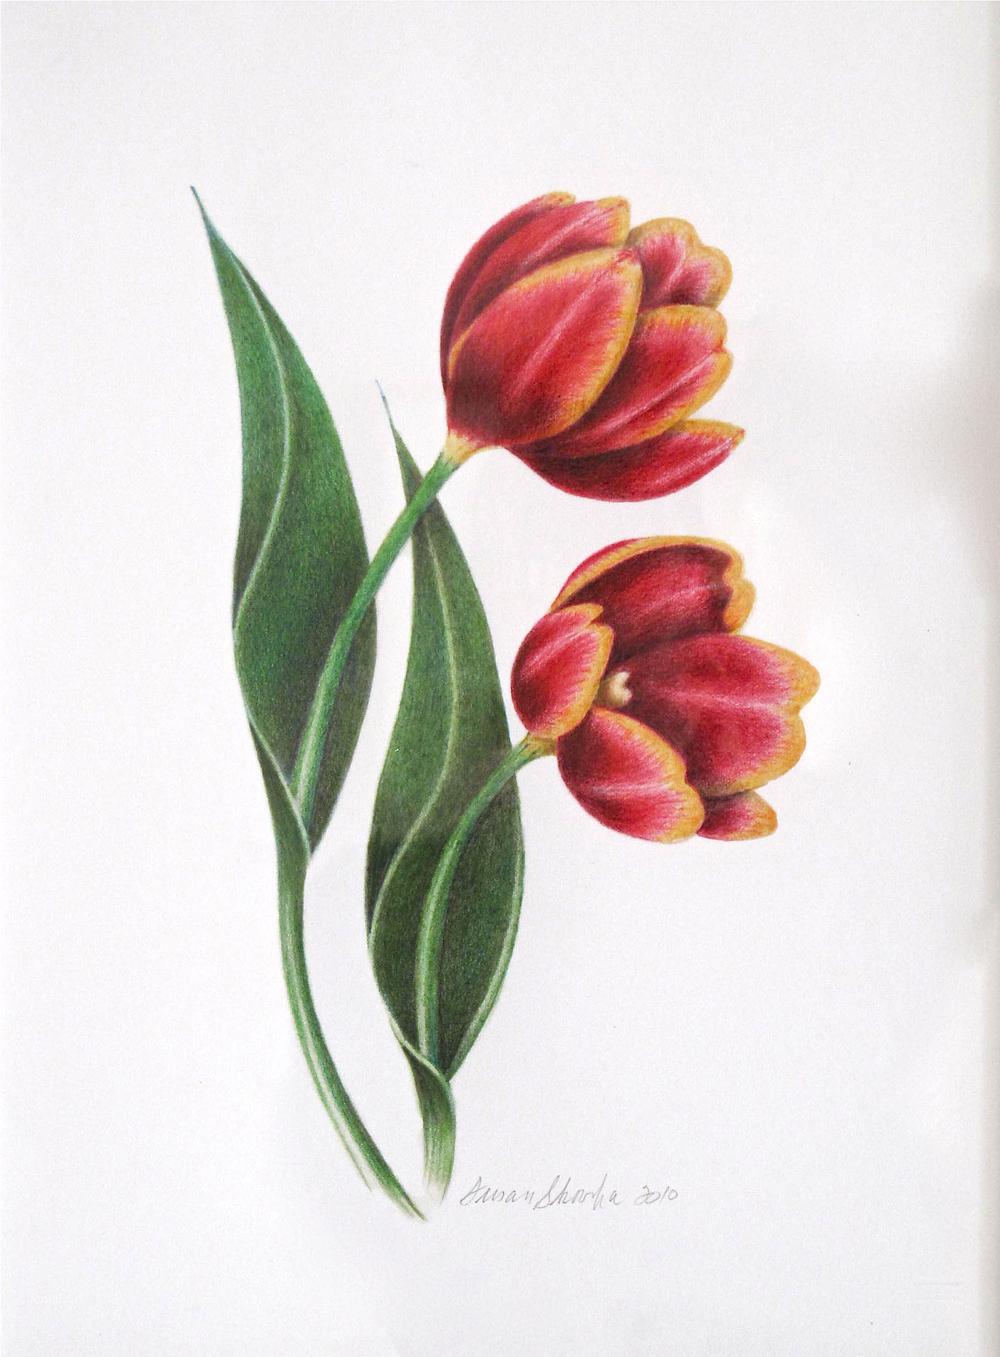 Susan Skoorka, Tulips